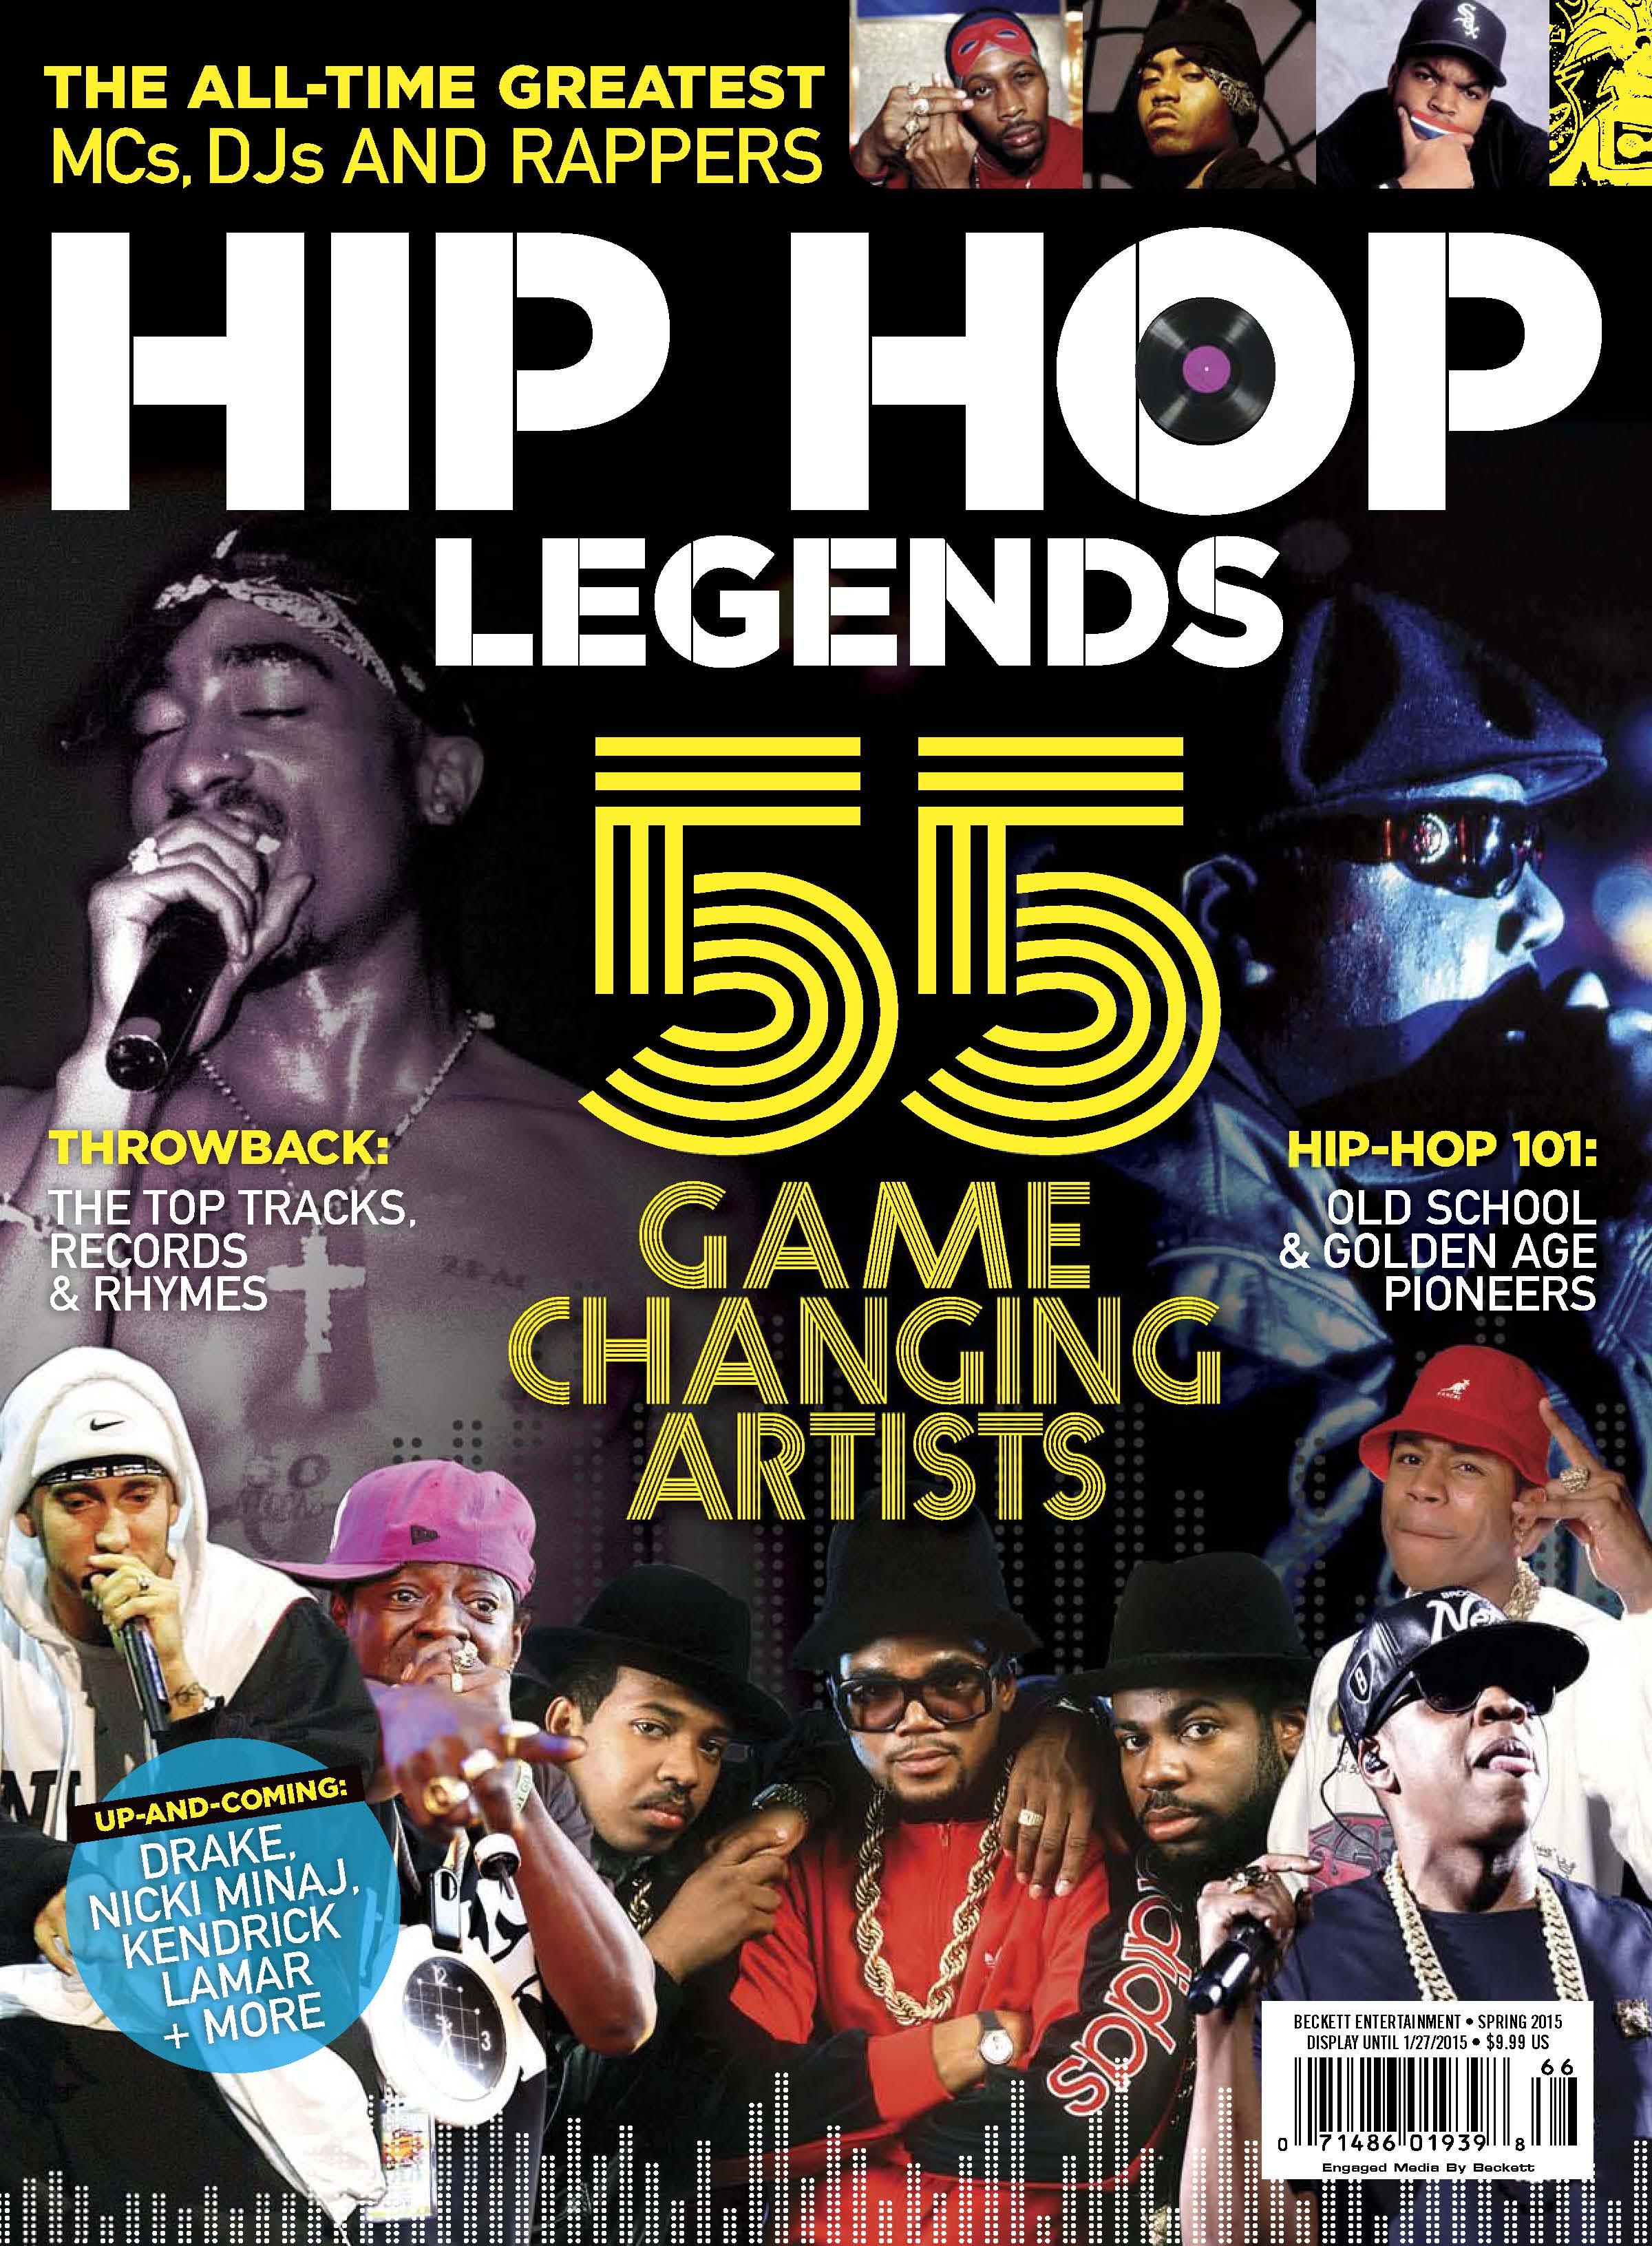 hip hop groups: